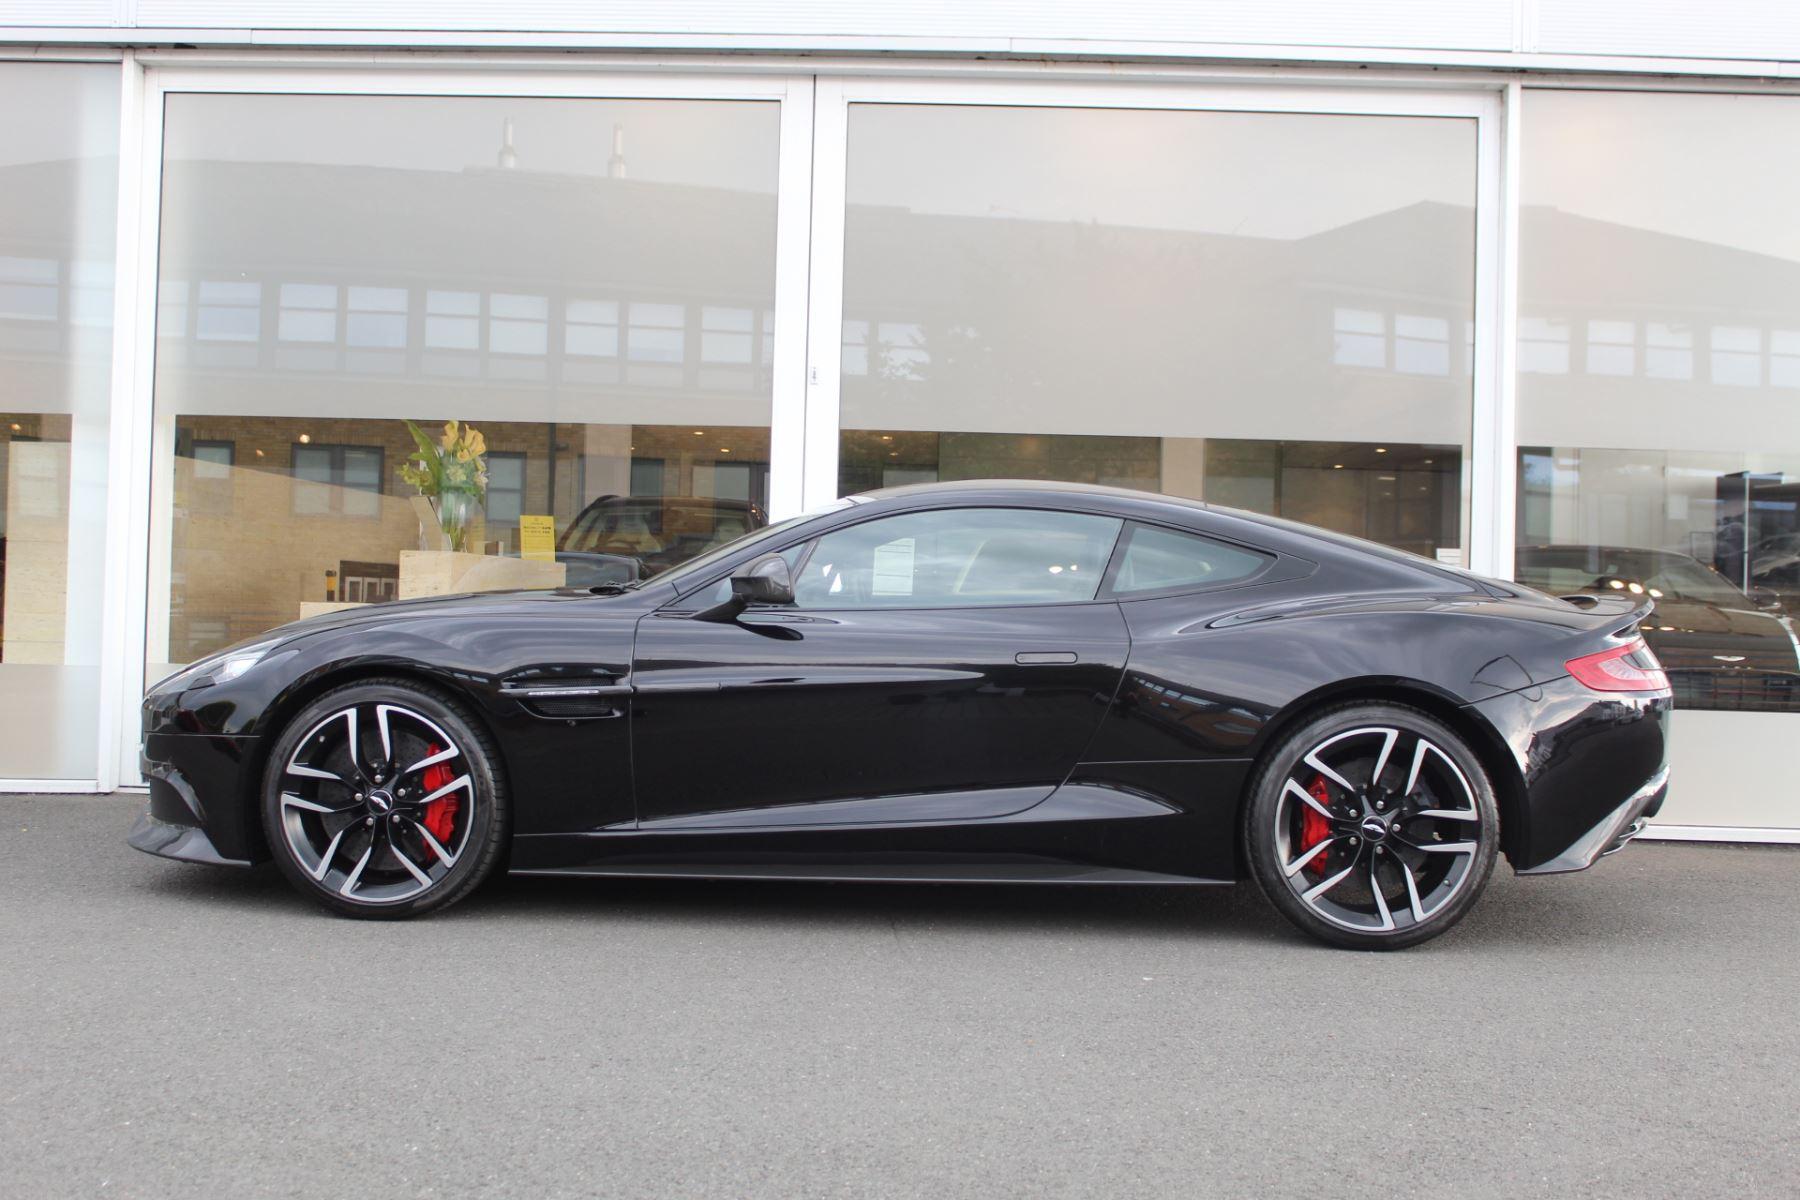 Aston Martin Vanquish V12 [568] 2+2 2dr Touchtronic  Carbon Black Edition  image 14